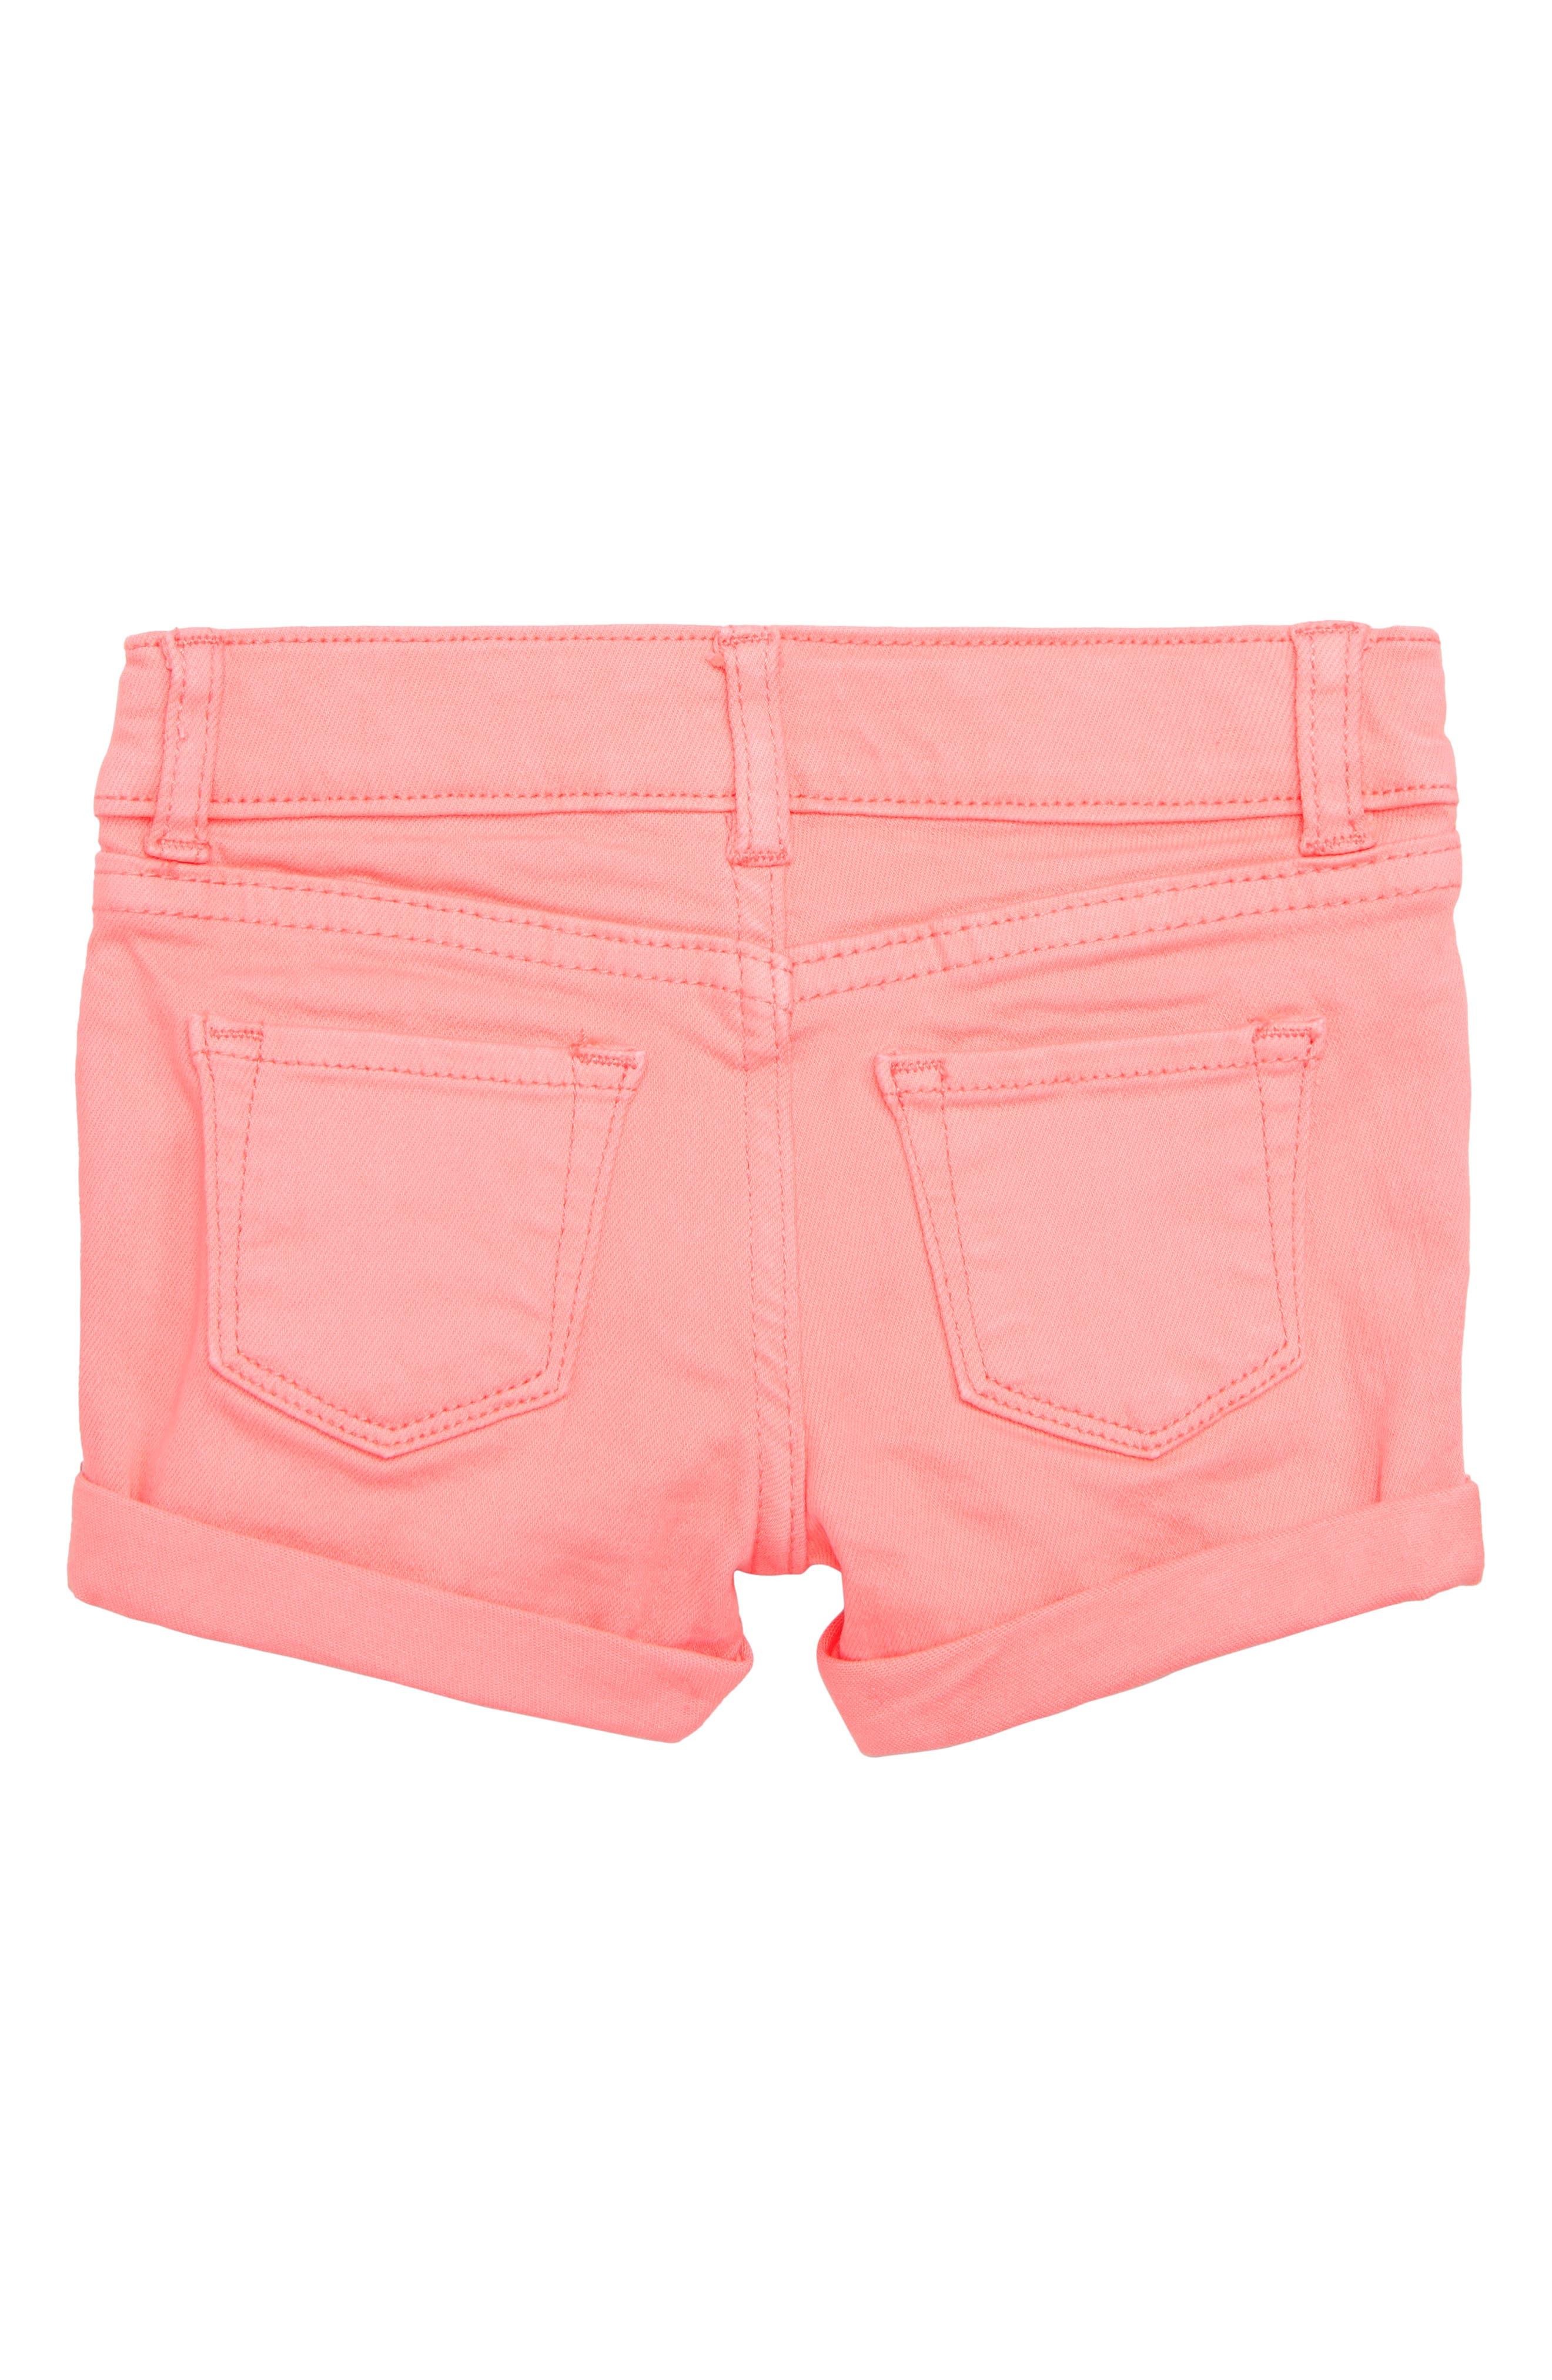 Griffin Stretch Cotton Shorts,                             Alternate thumbnail 2, color,                             Neon Coral